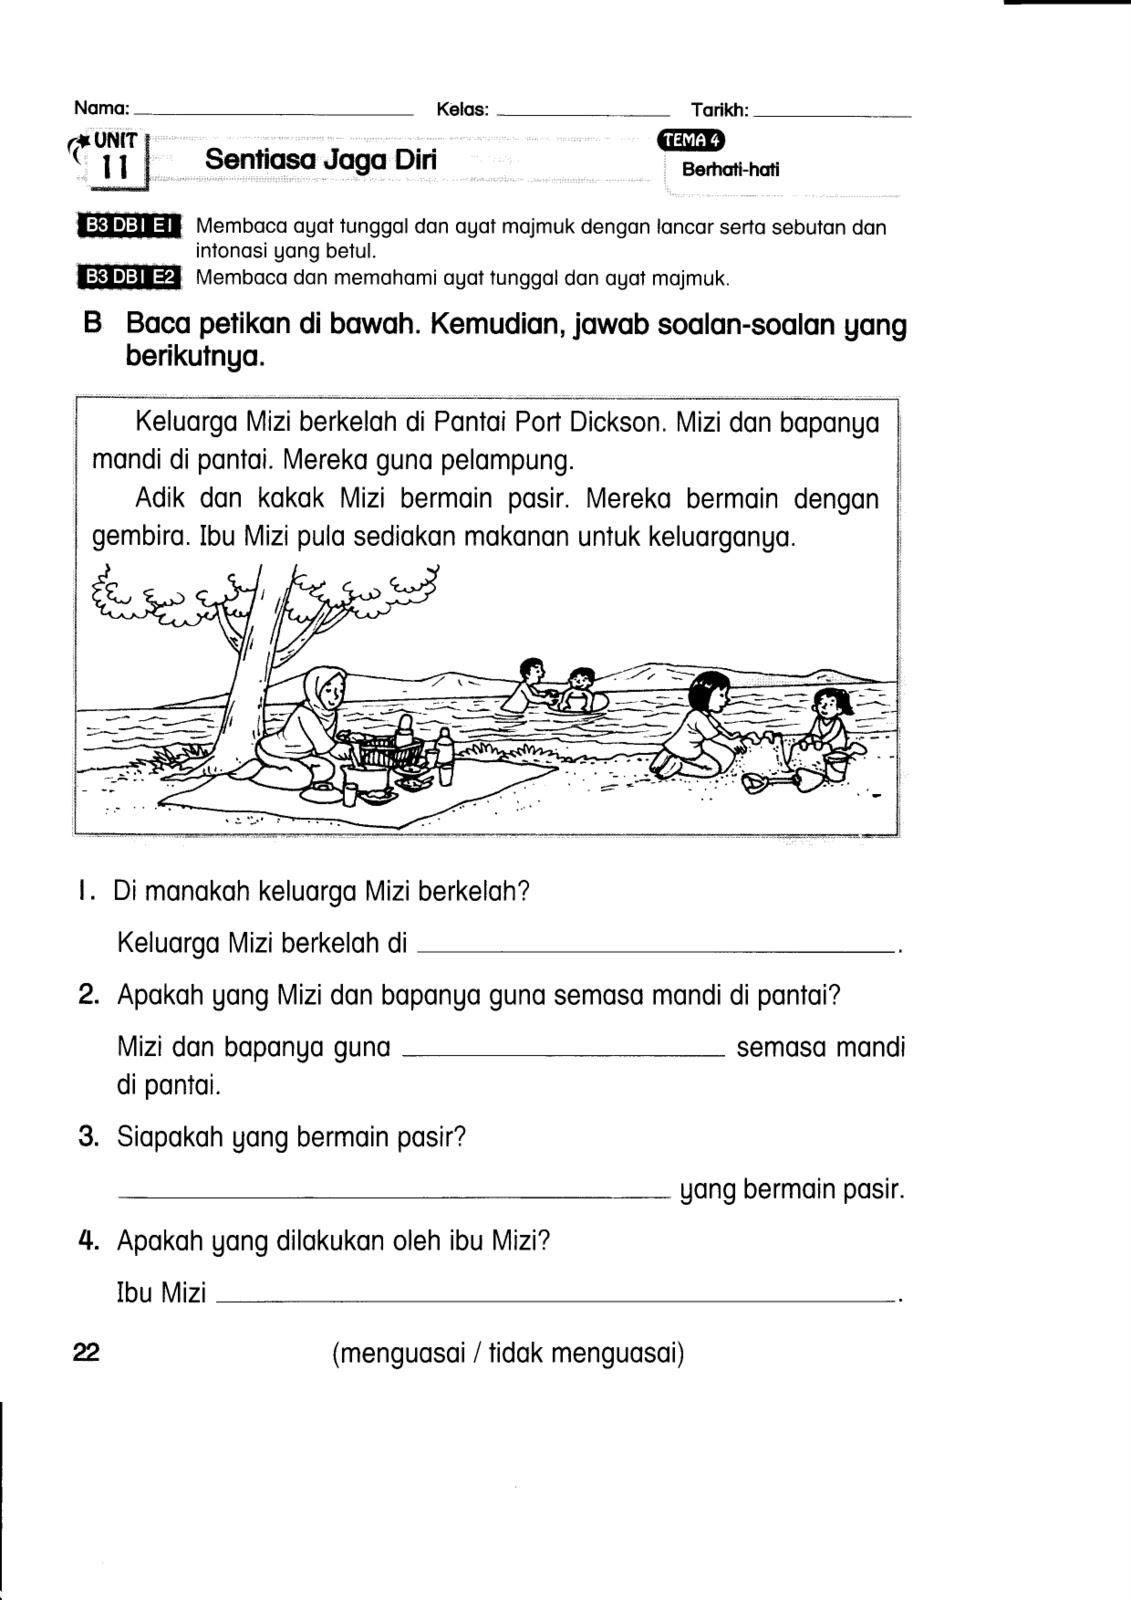 Contoh Soalan Bahasa Melayu Tahun 4 Penulisan Soalan Aw